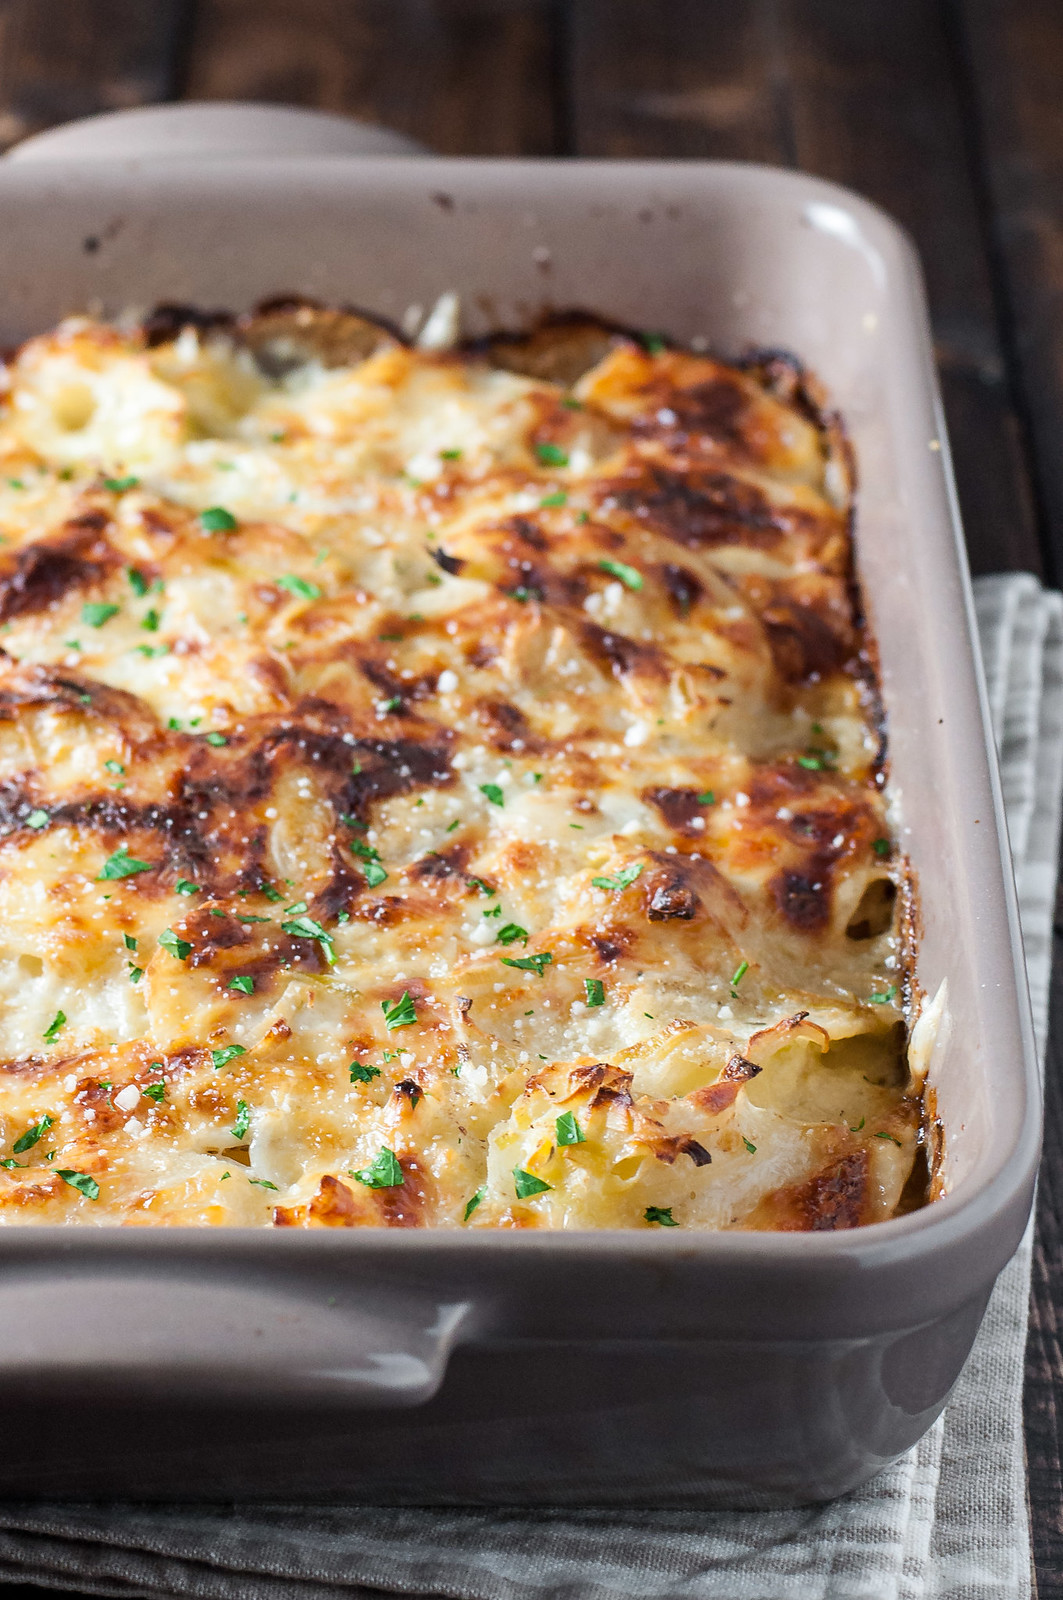 Life-saving, gluten-free potato gratin with leeks